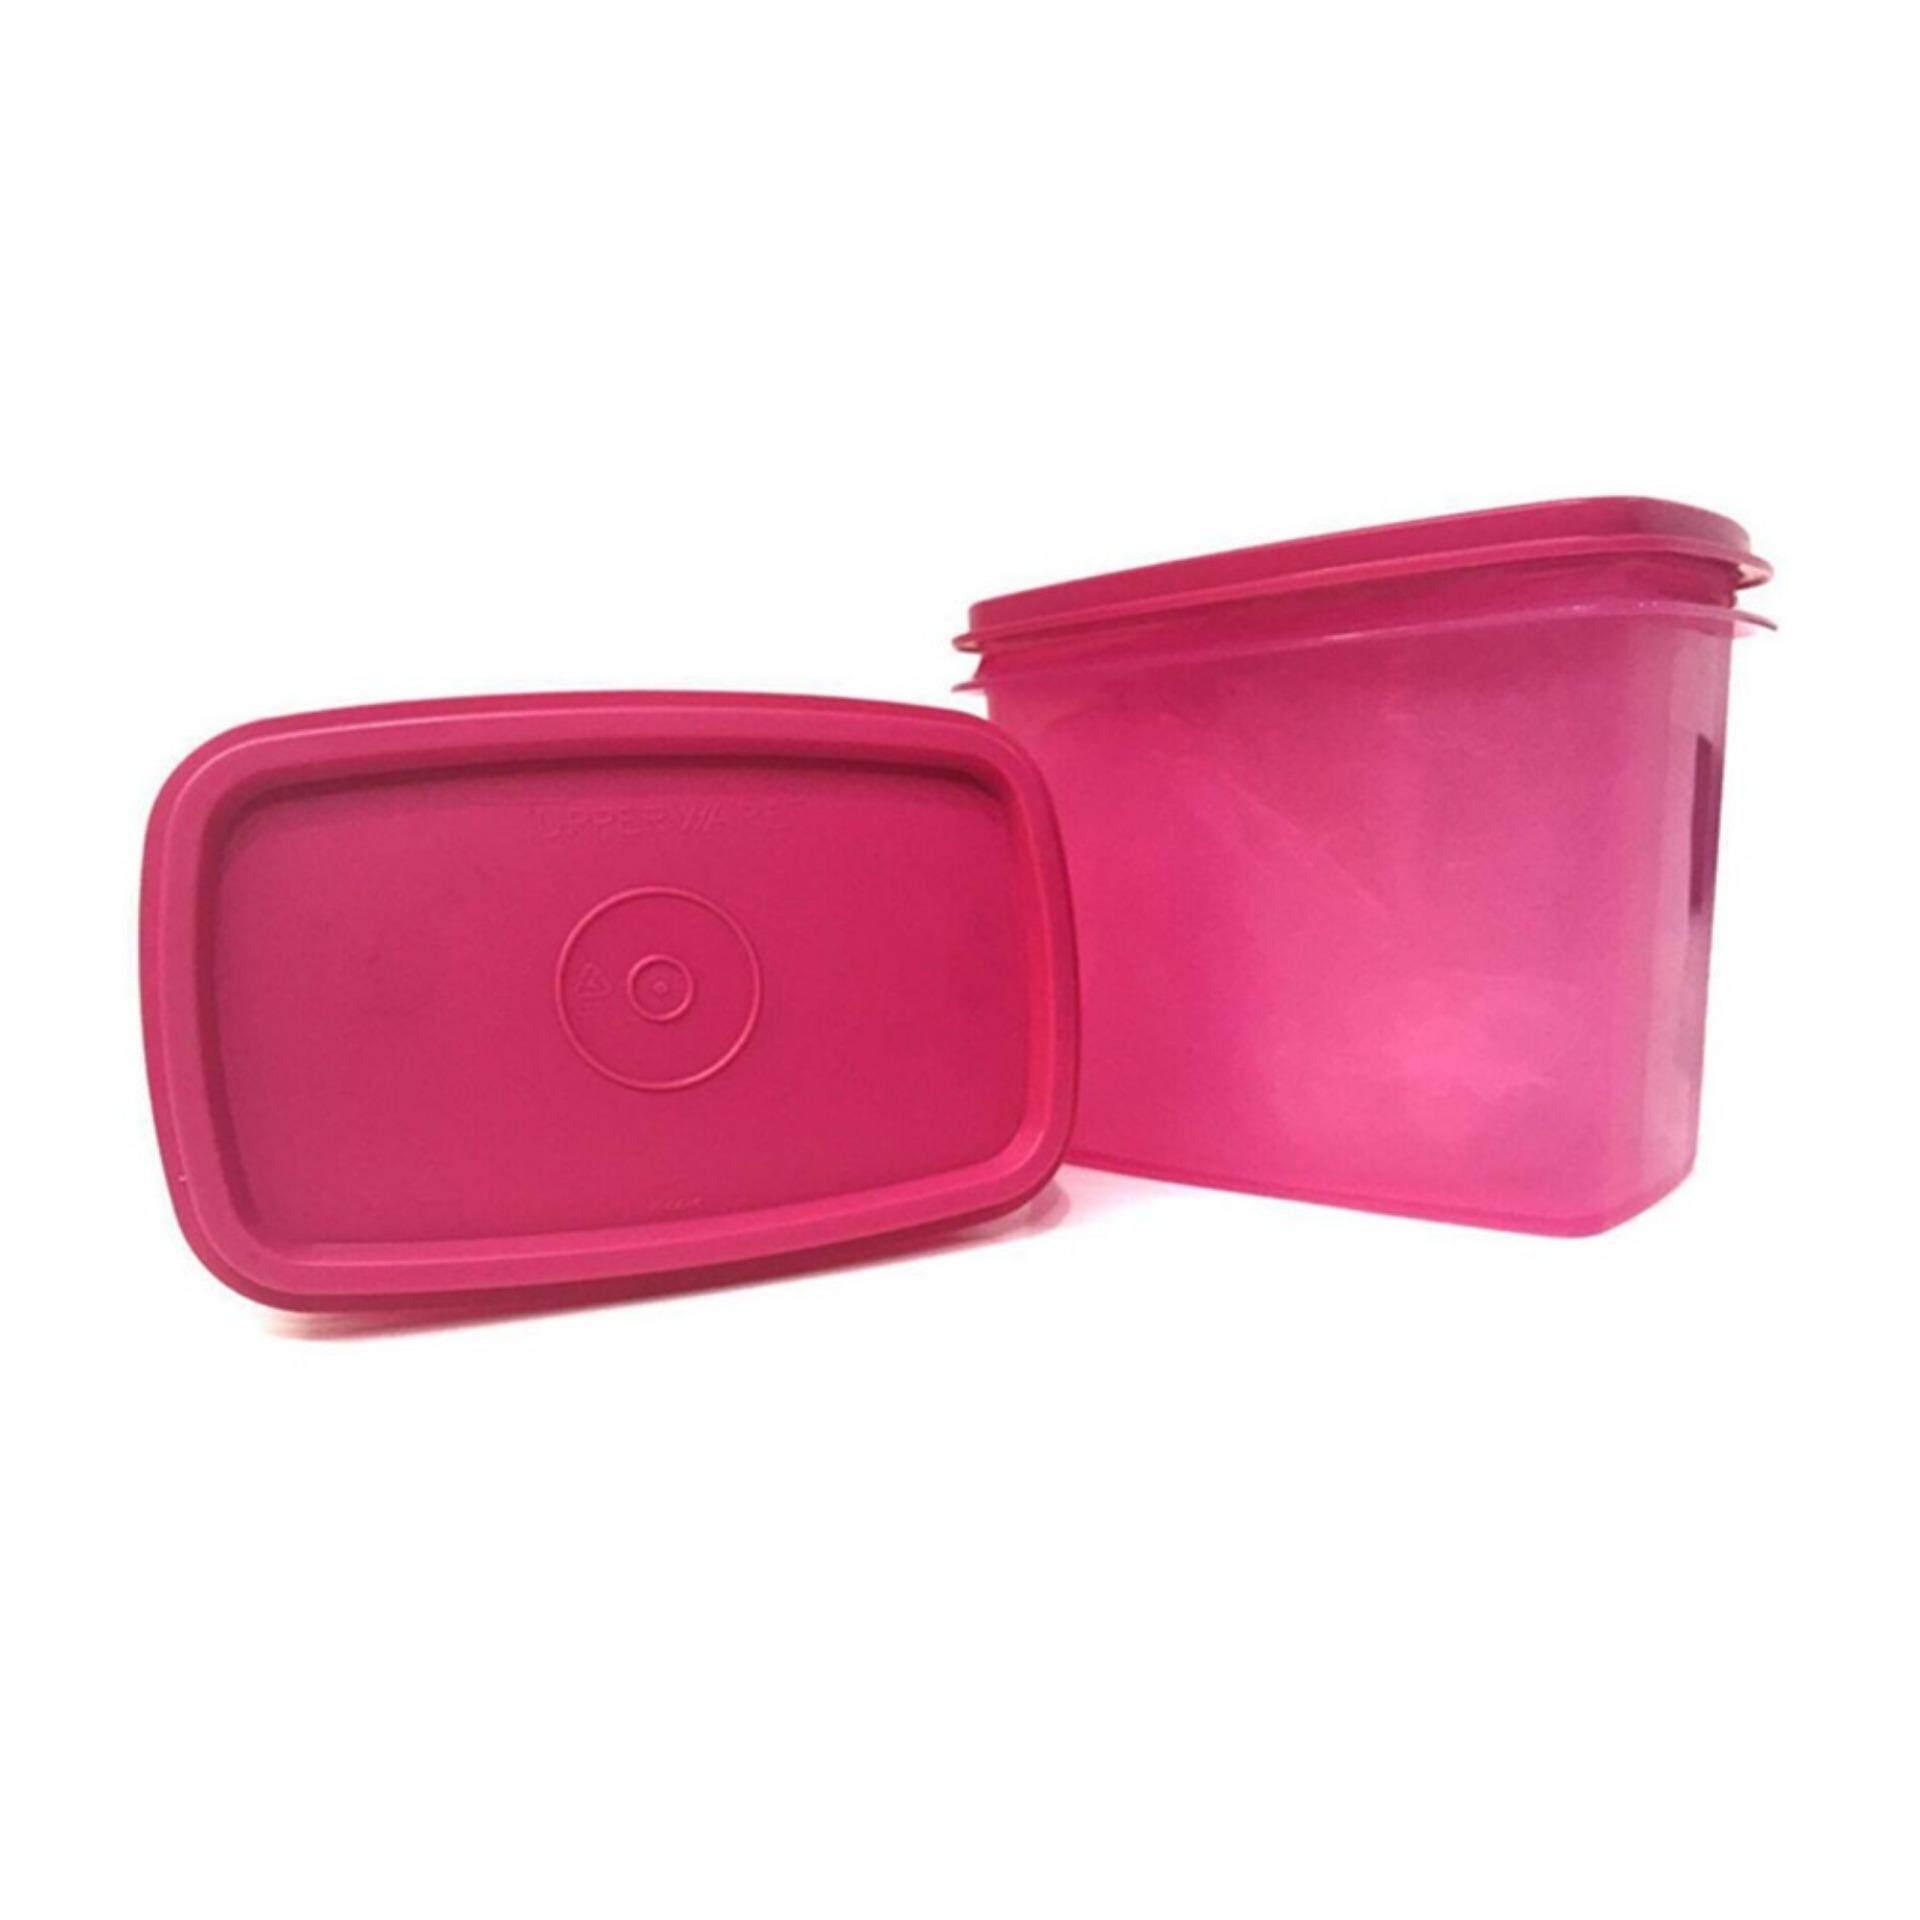 Tupperware Shelf Saver (1)pc 840ml Only - Pink